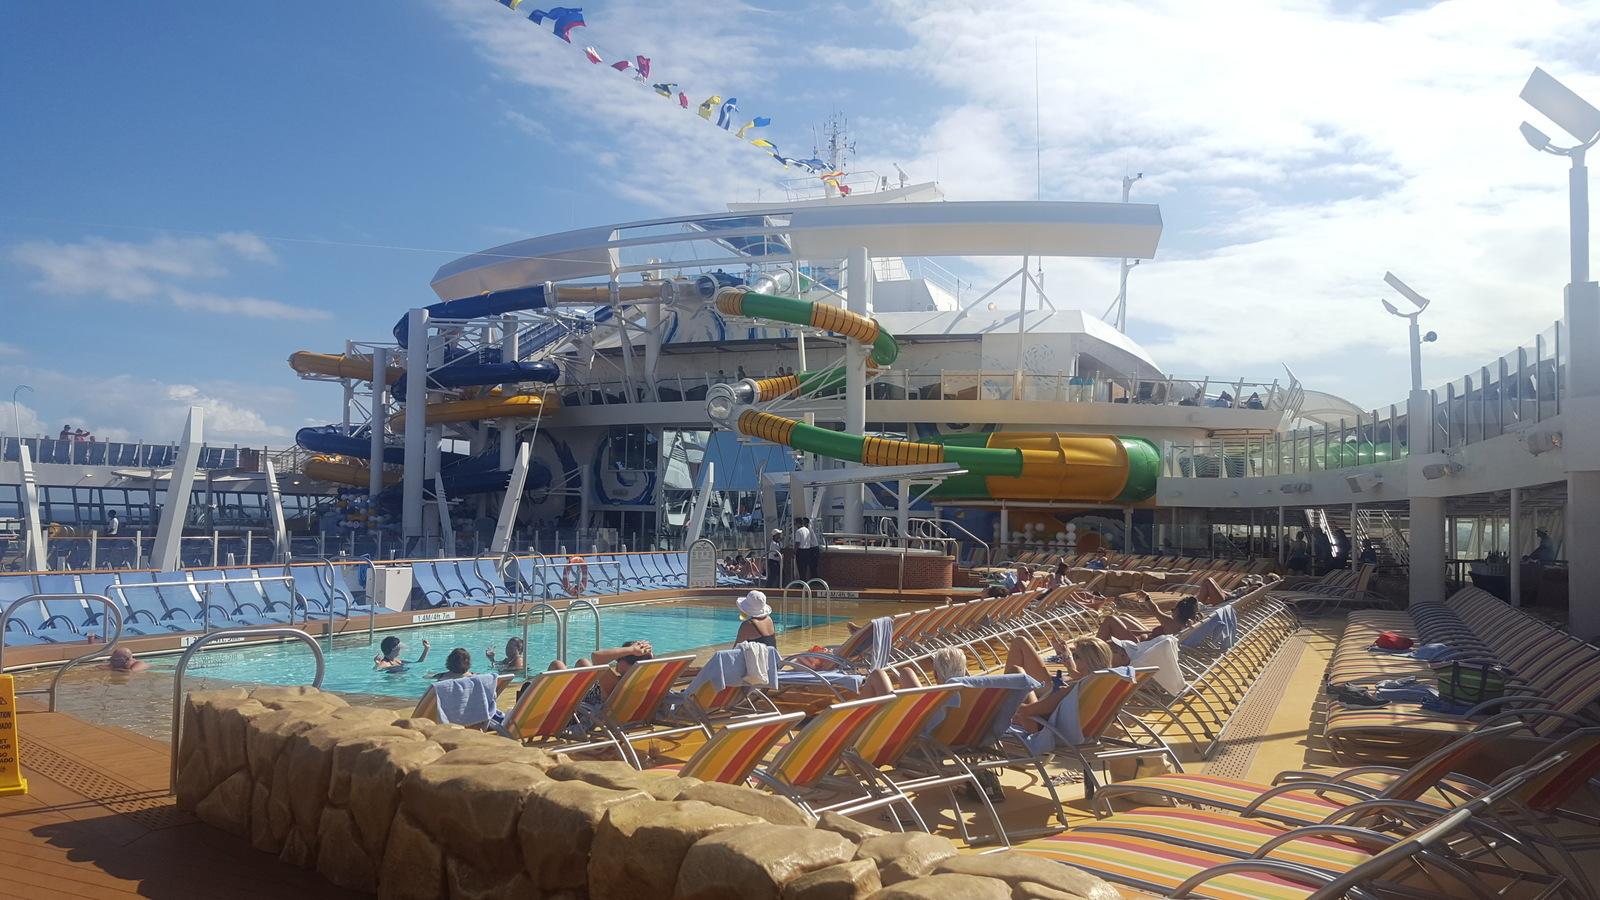 Harmony Of The Seas Royal Caribbean Fort Lauderdale